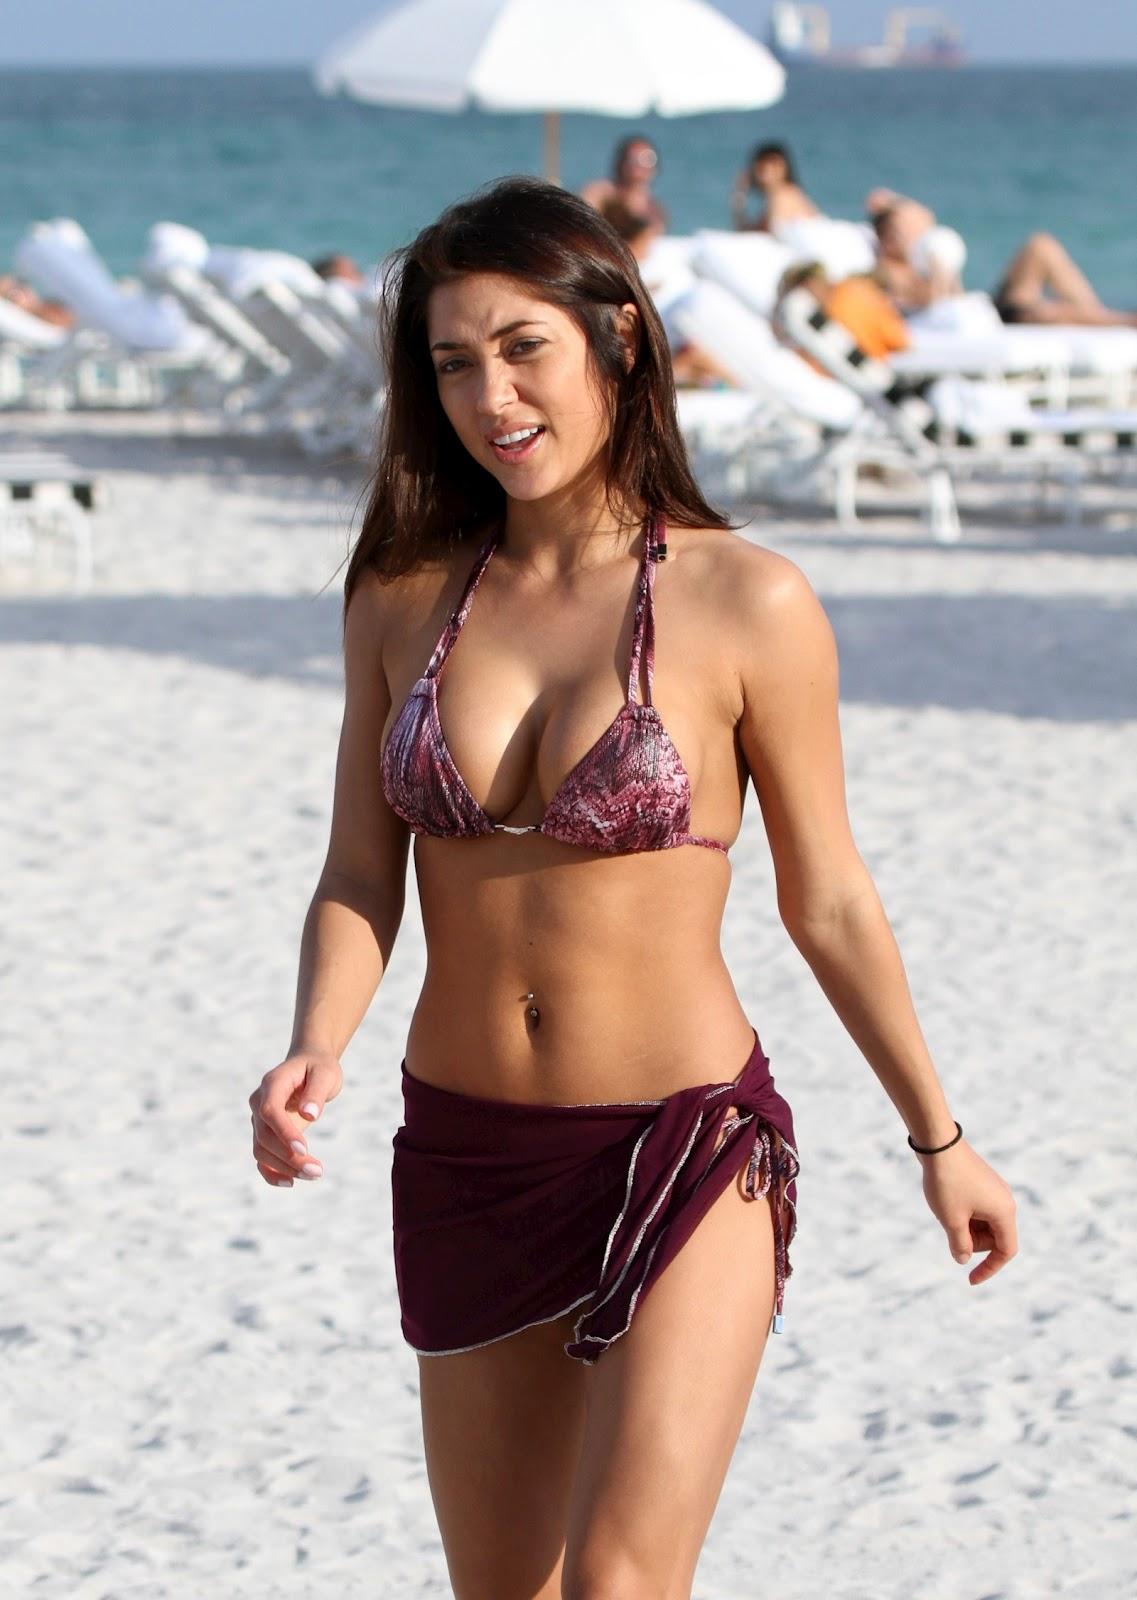 bikini Arianny celeste